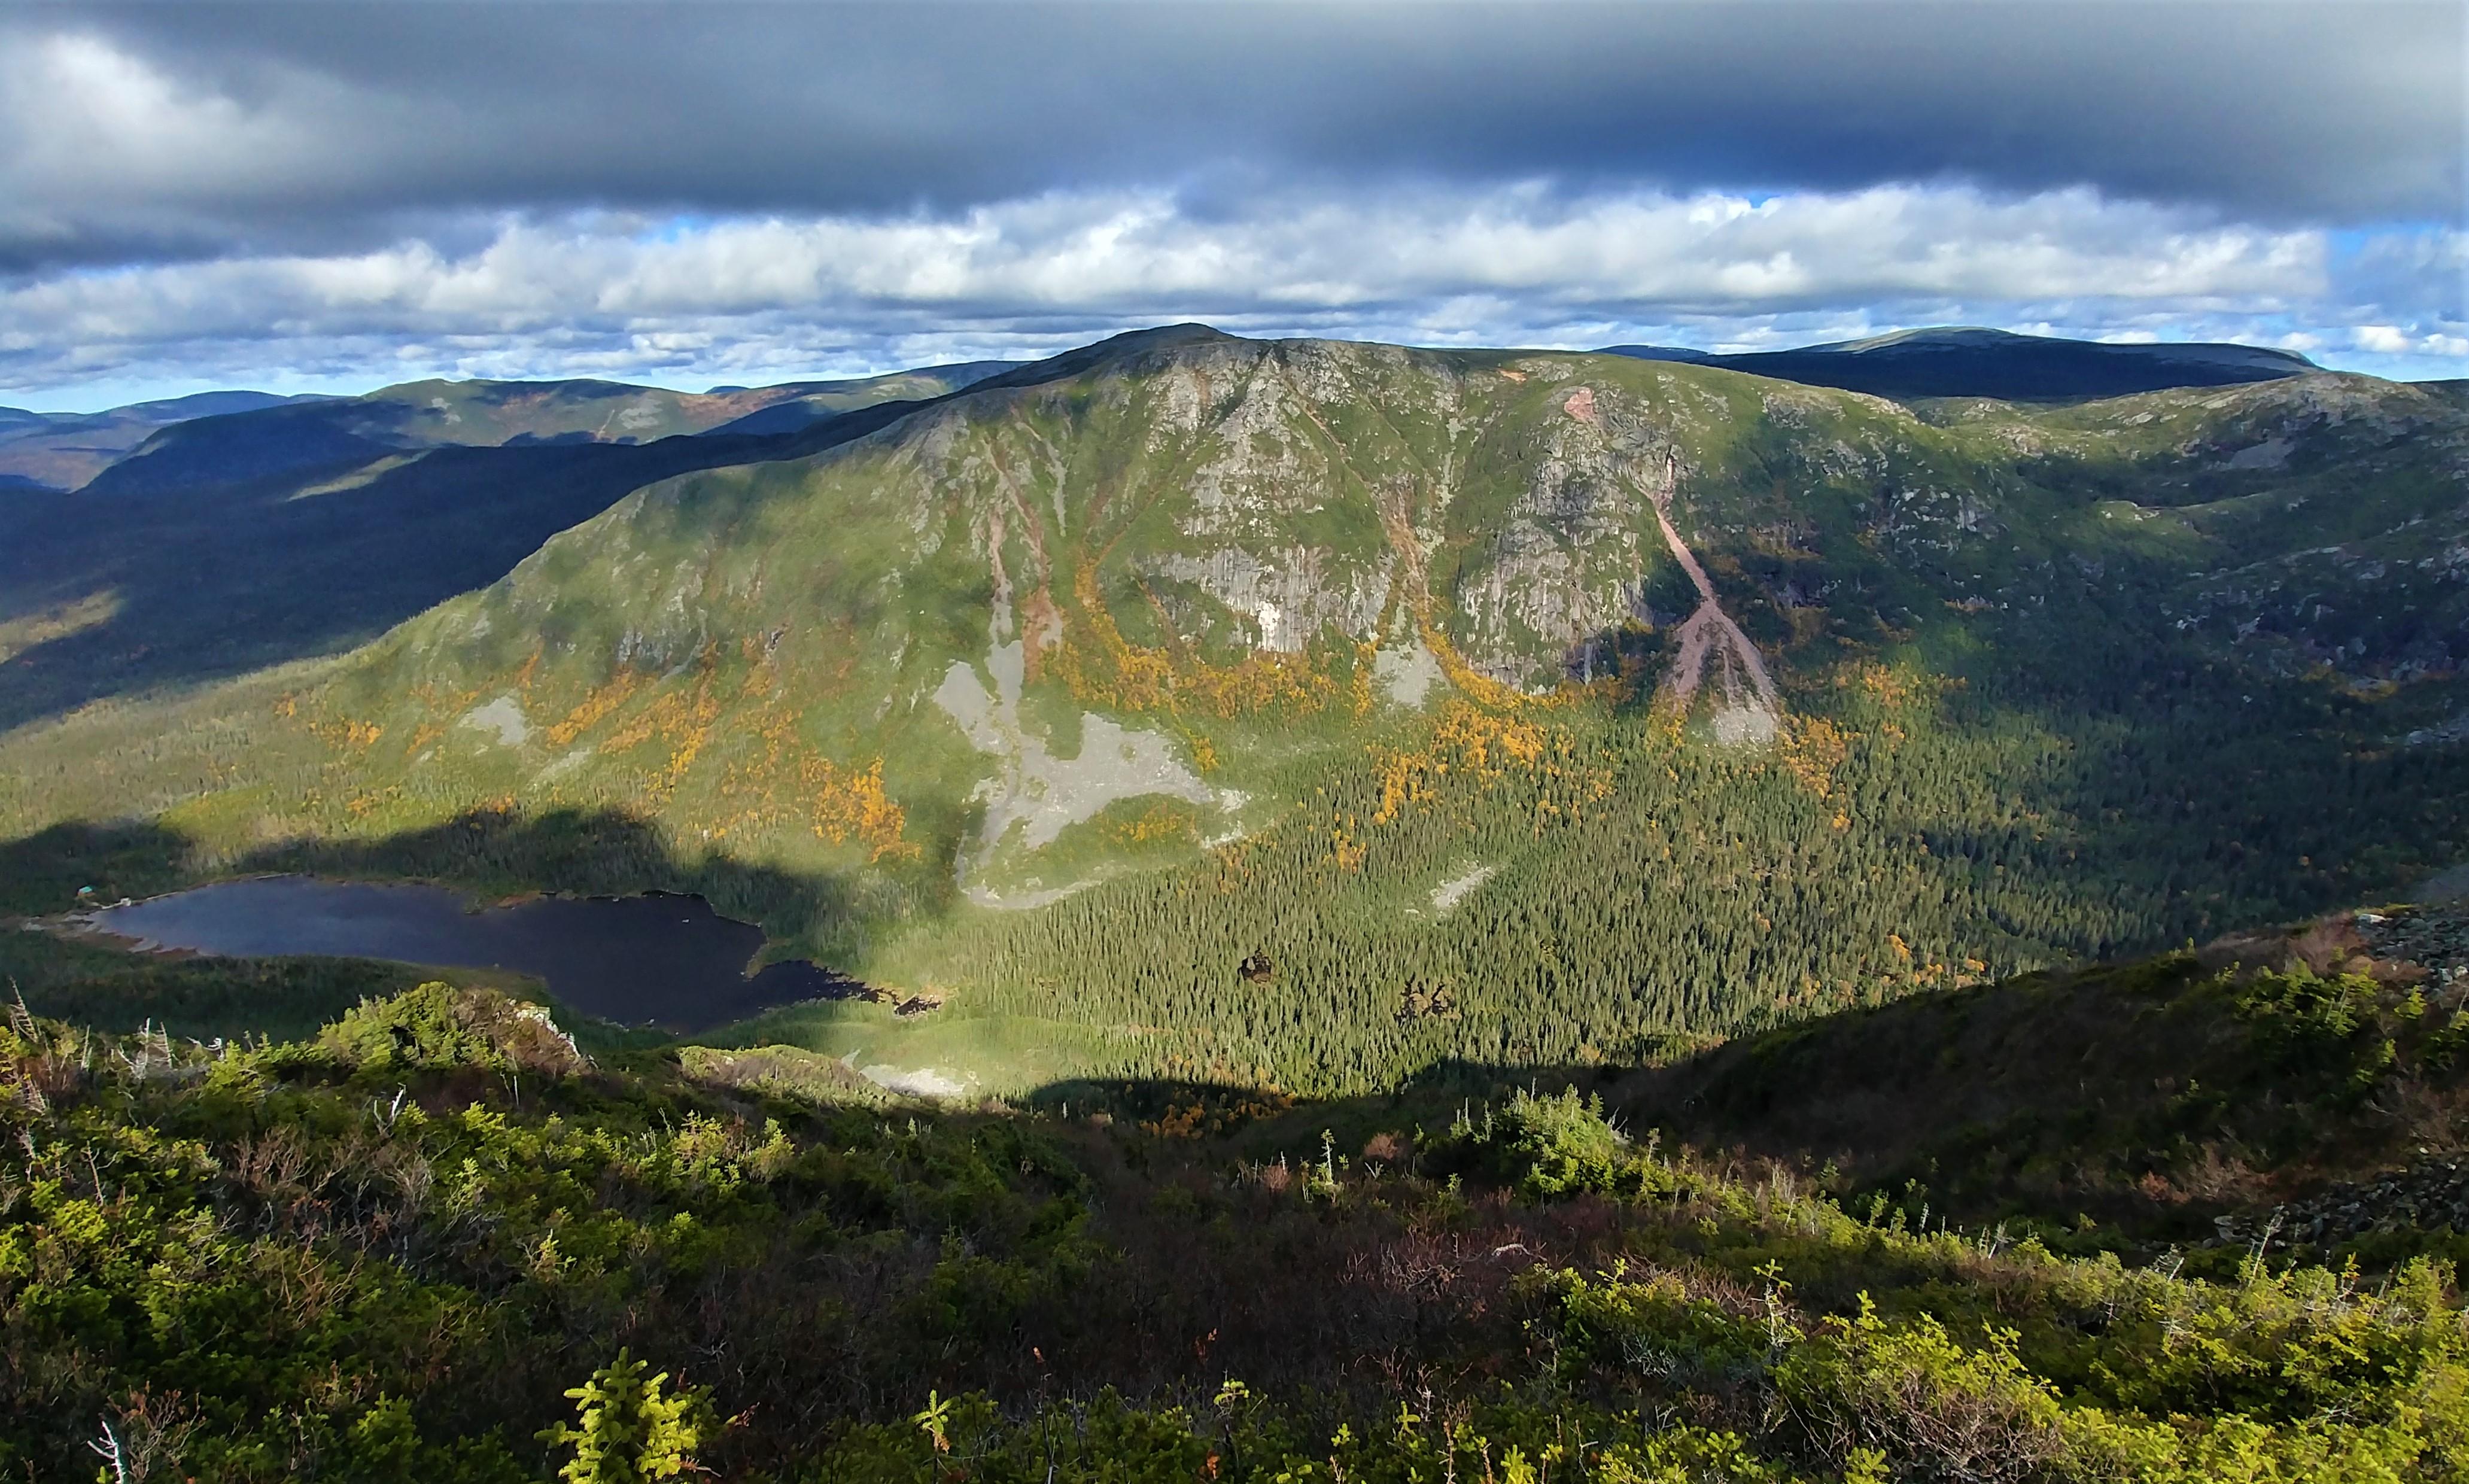 randonnee difficile mont joseph fortin parc national gaspesie infos pratiques blog road-trip canada arpenter le chemin